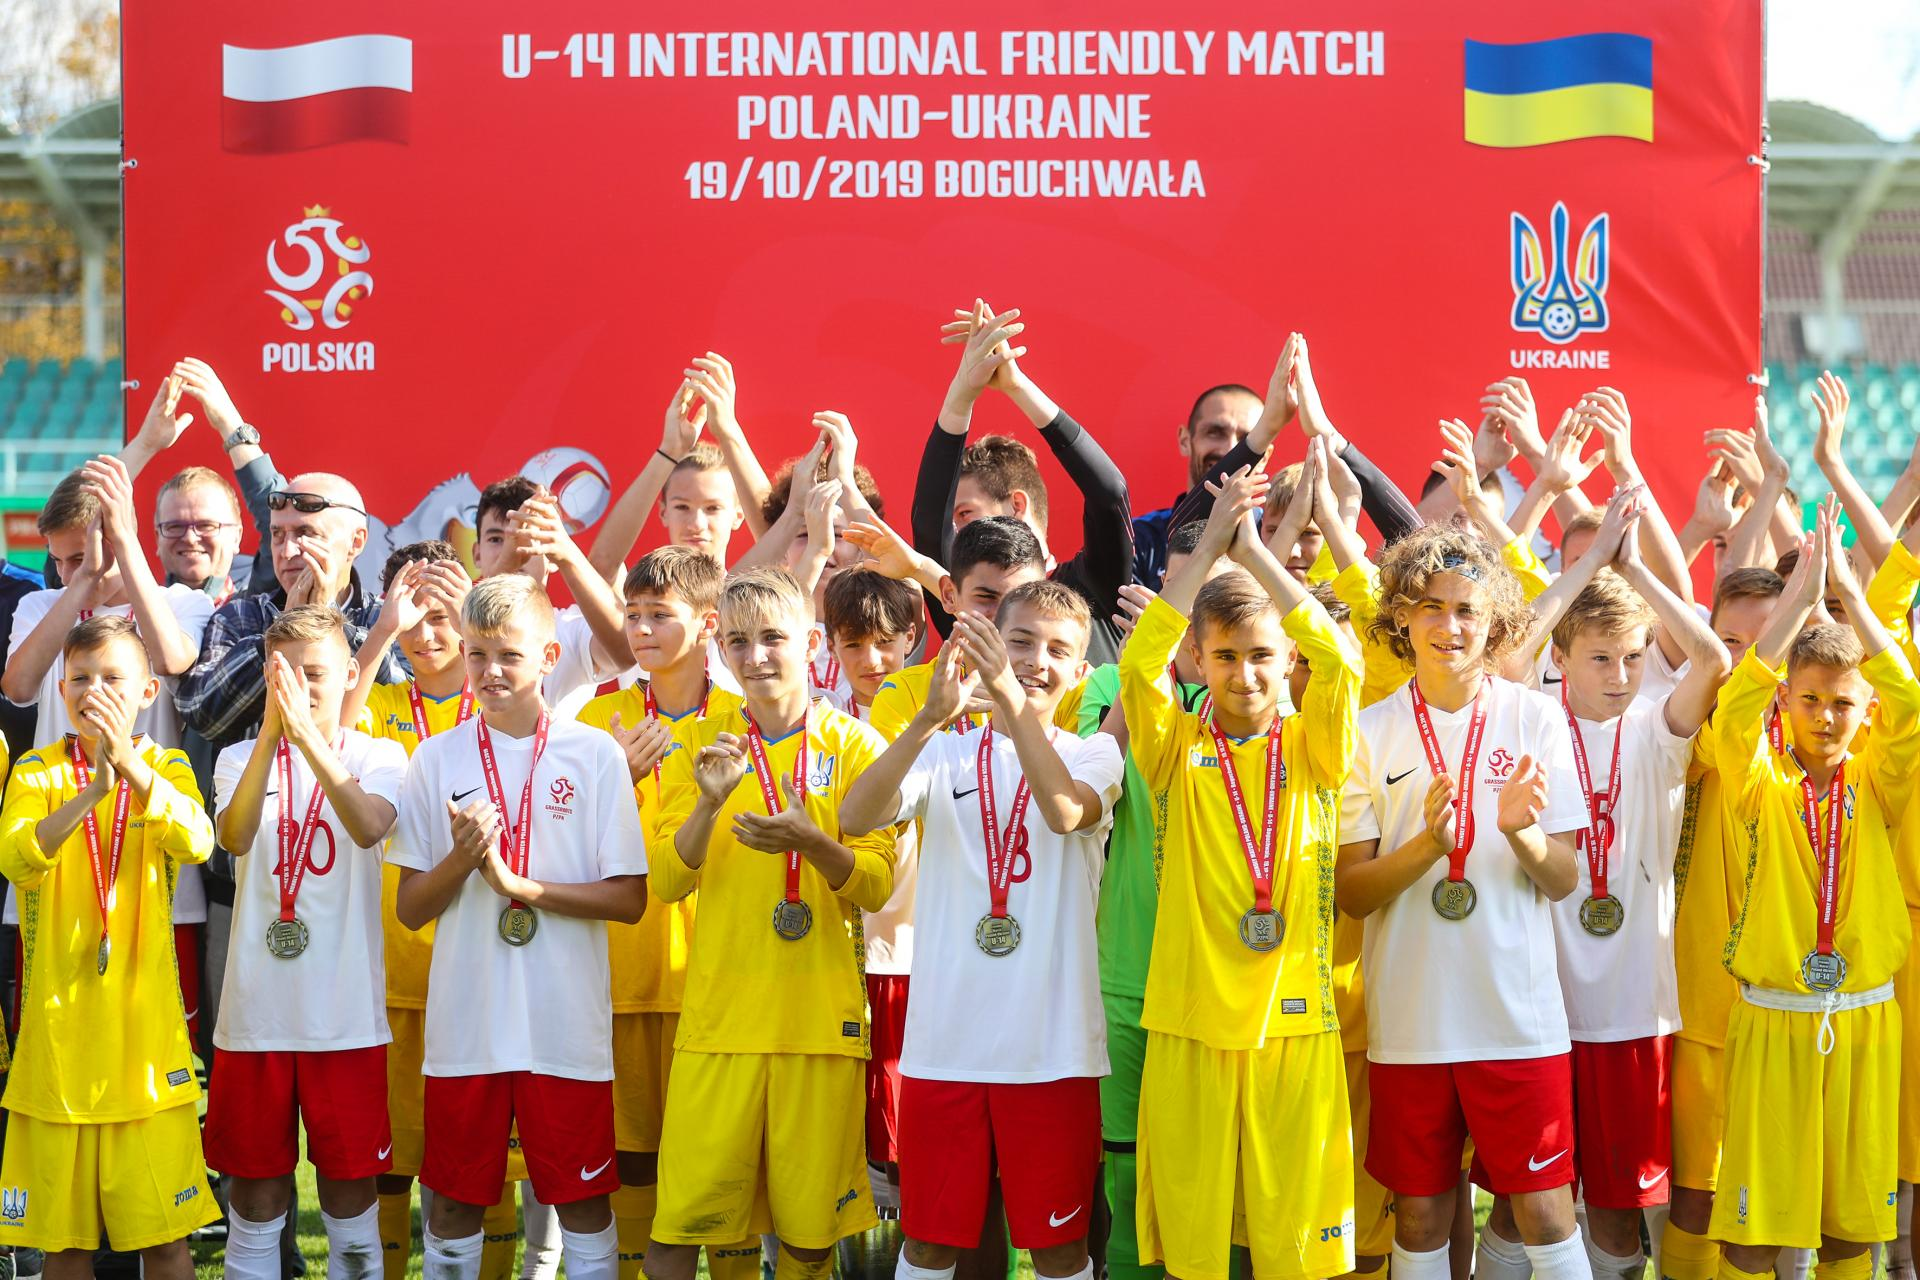 Dekoracja po meczu Polska - Ukraina 5:0 U-14 (19.10.2019).